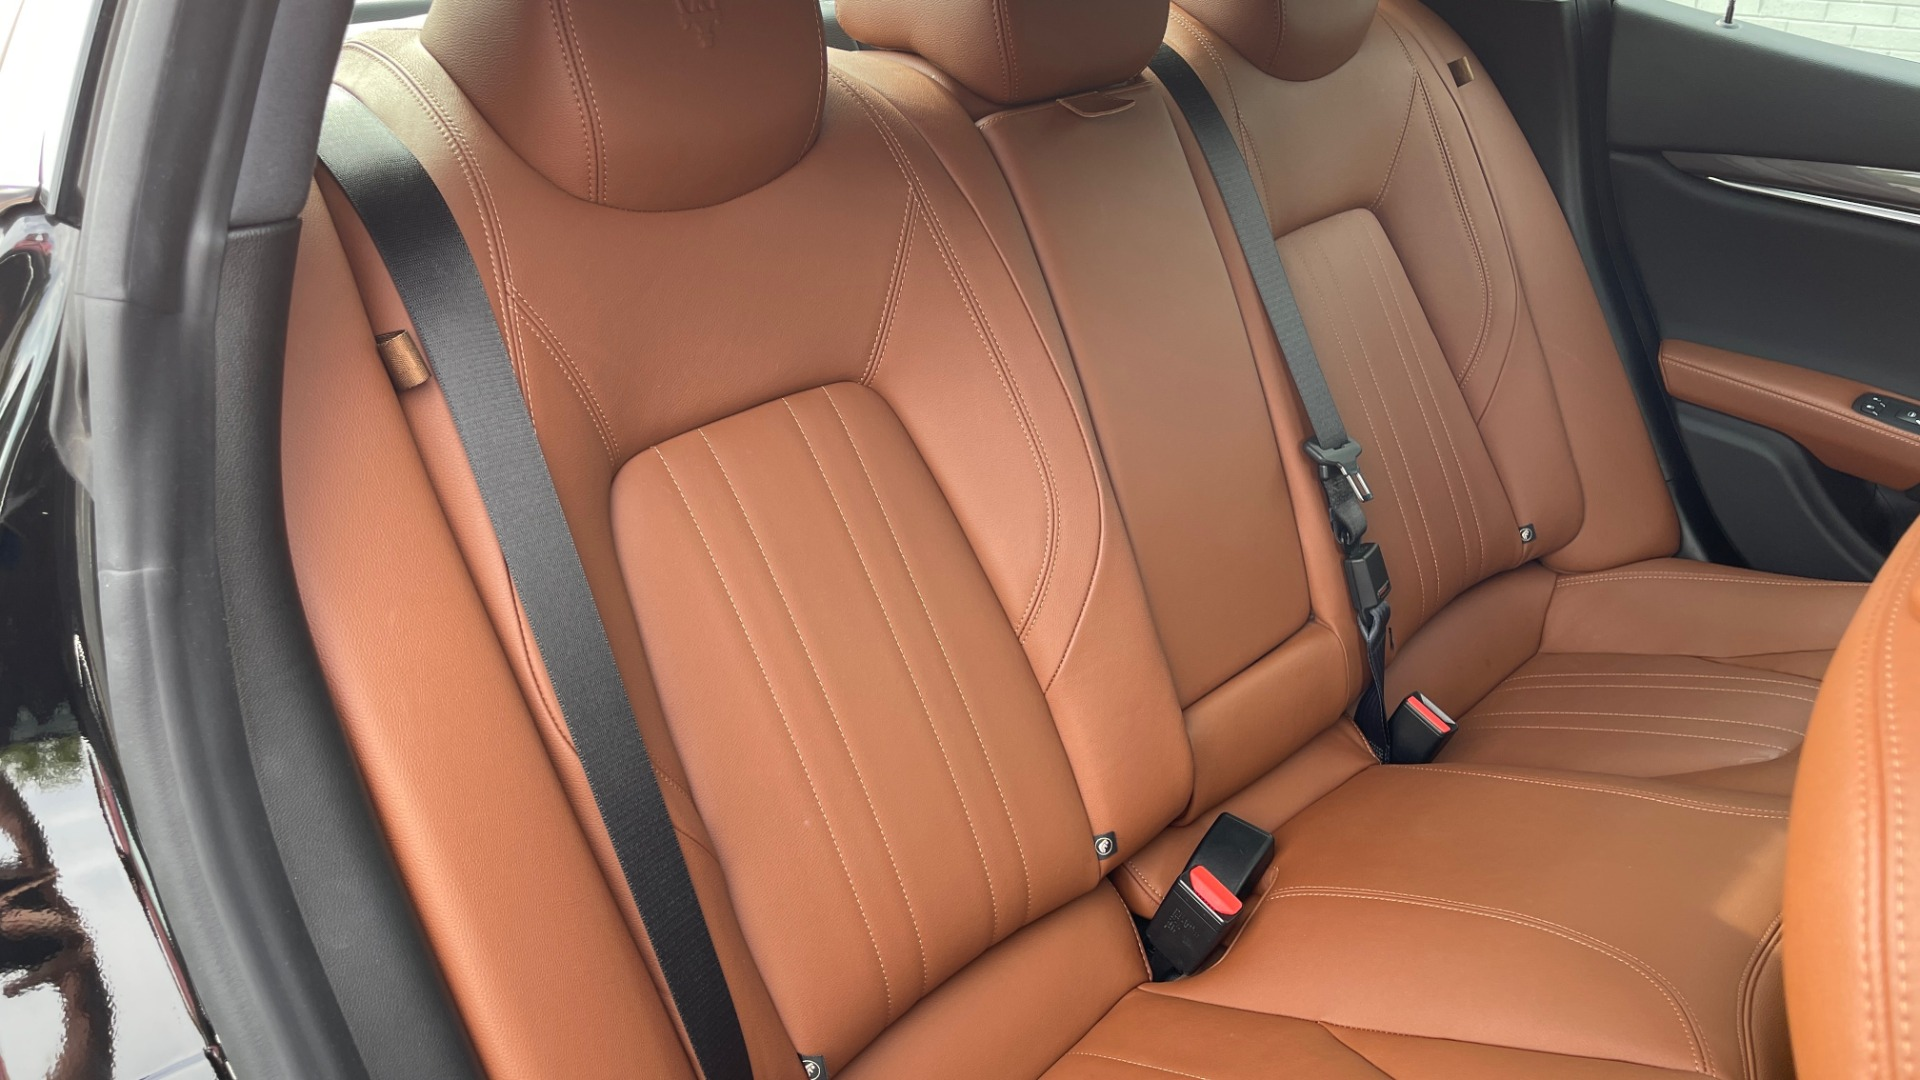 Used 2018 Maserati GHIBLI 3.0L SEDAN / 8-SPD AUTO / NAV / SUNROOF / REARVIEW for sale $42,995 at Formula Imports in Charlotte NC 28227 56